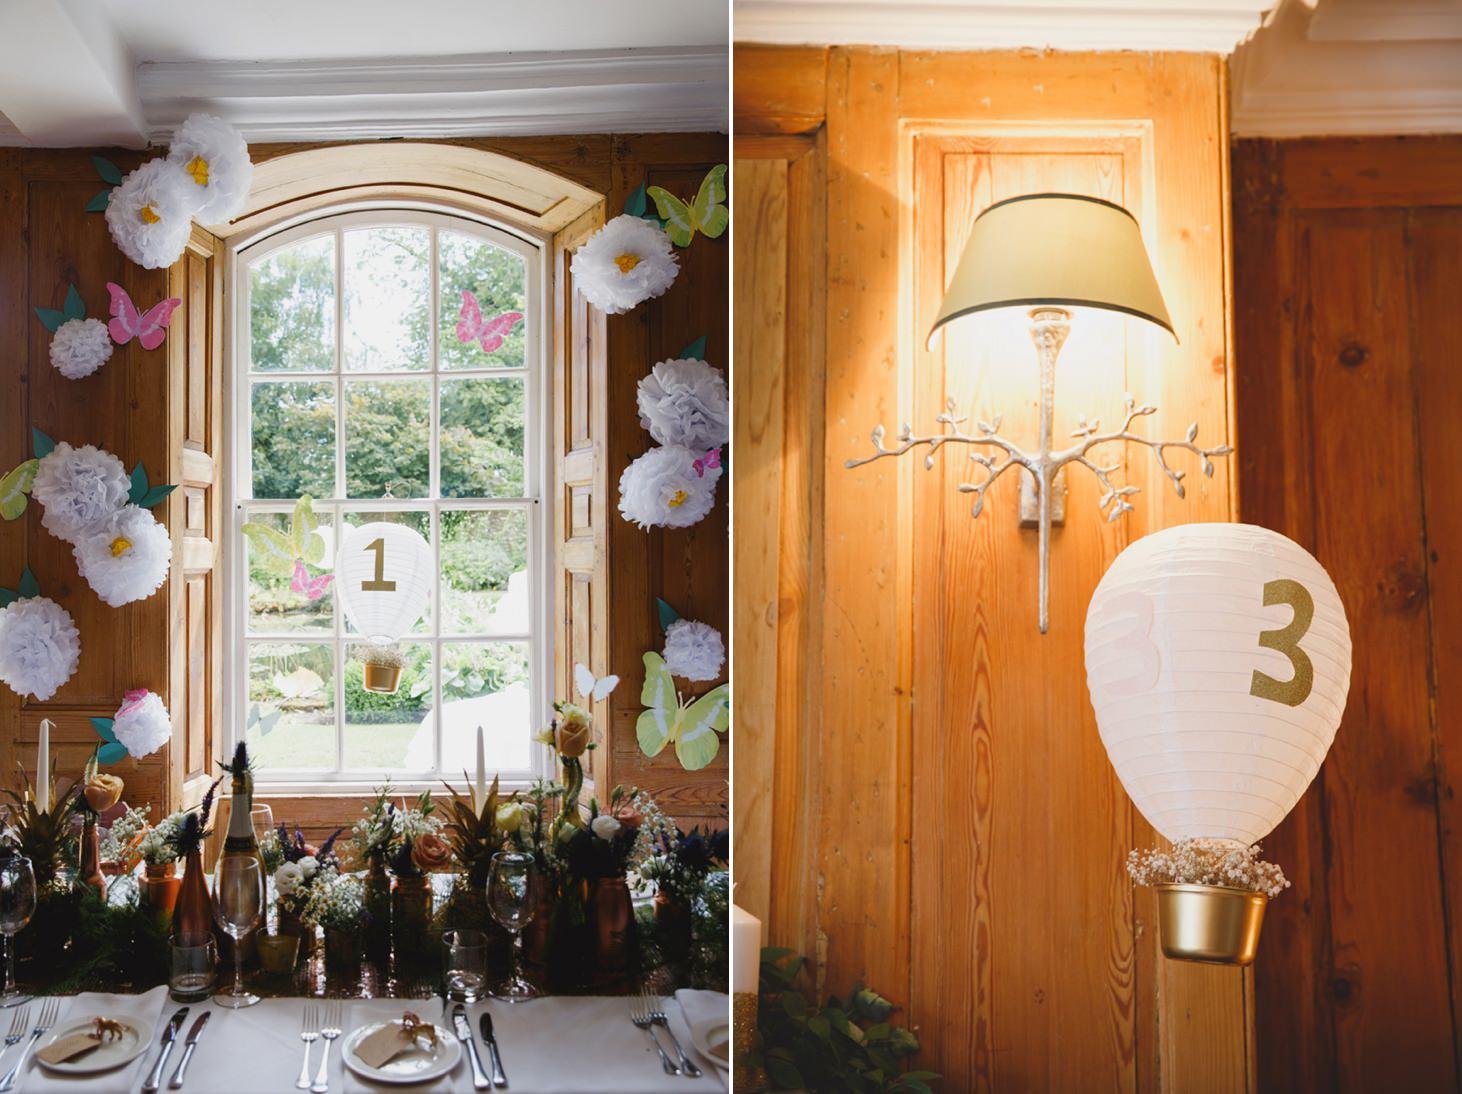 The Rectory Hotel Crudwell interior decorations handmade